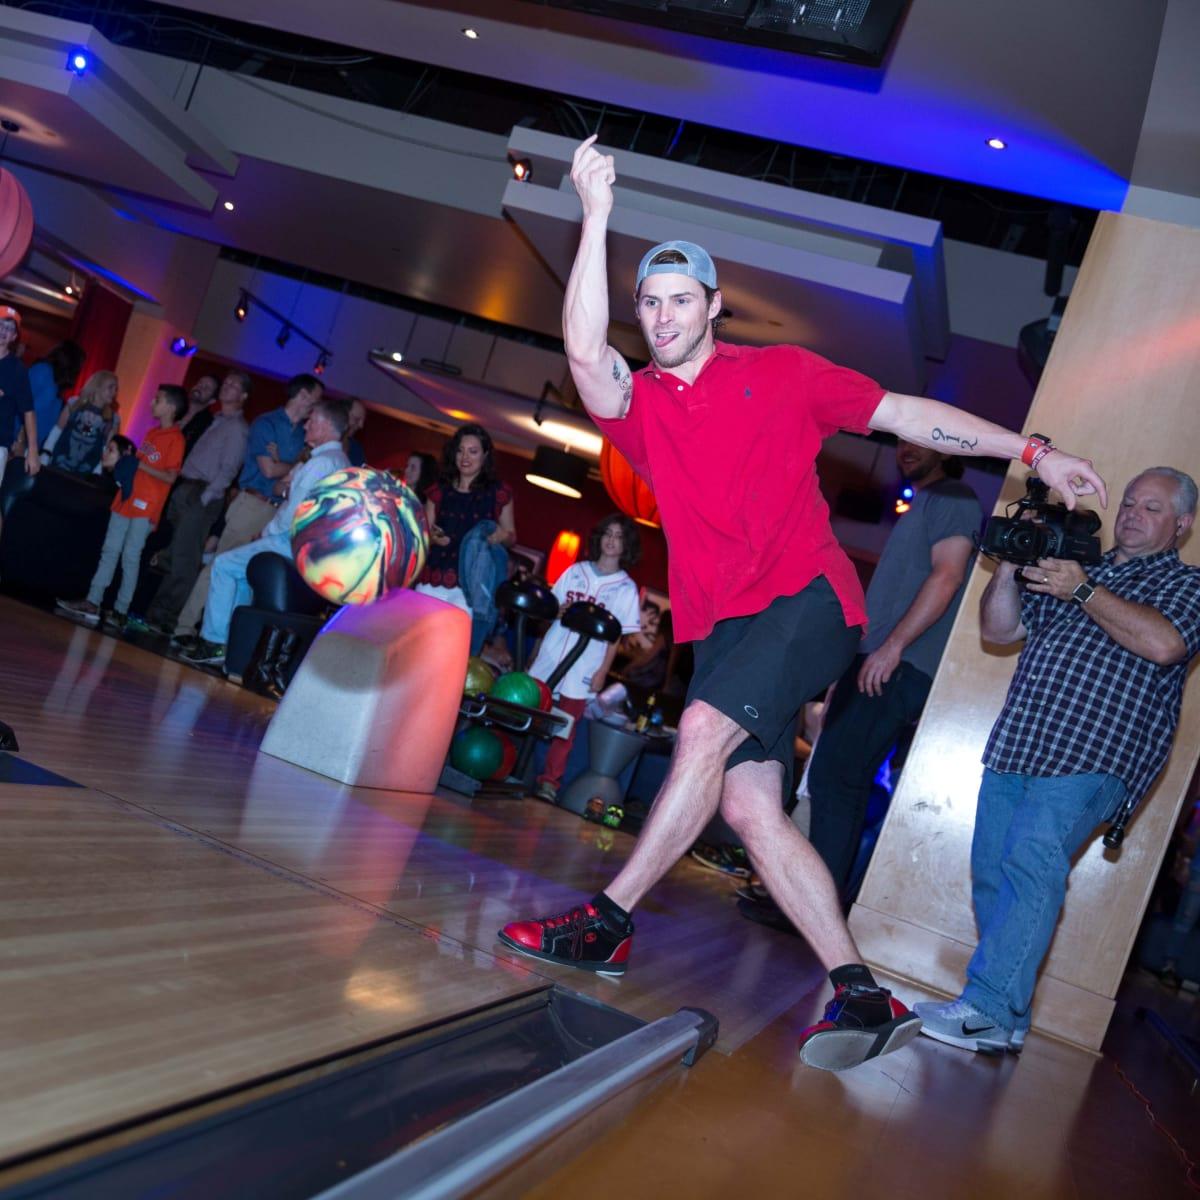 Houston, George Springer All Star Bowling Benefit for Camp Say, June 2017, Josh Reddick